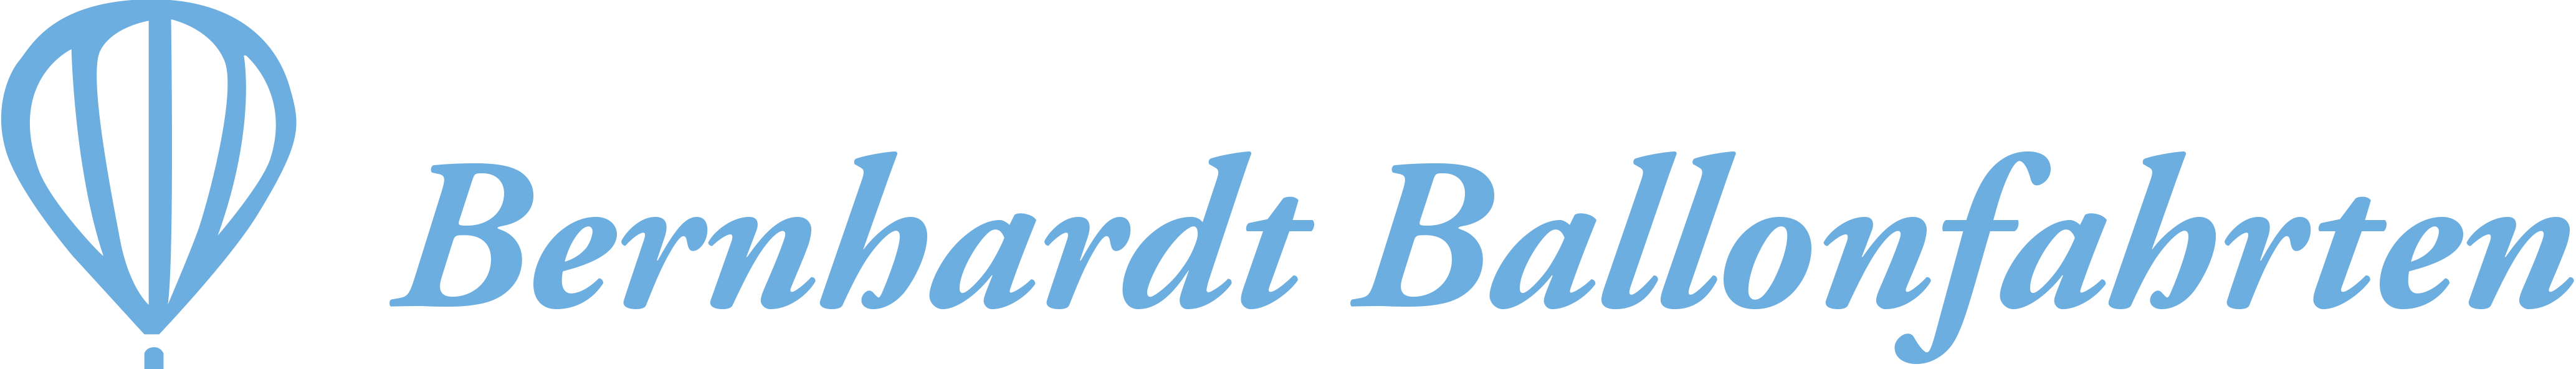 Bernhardt-Ballonfahrten-Logo